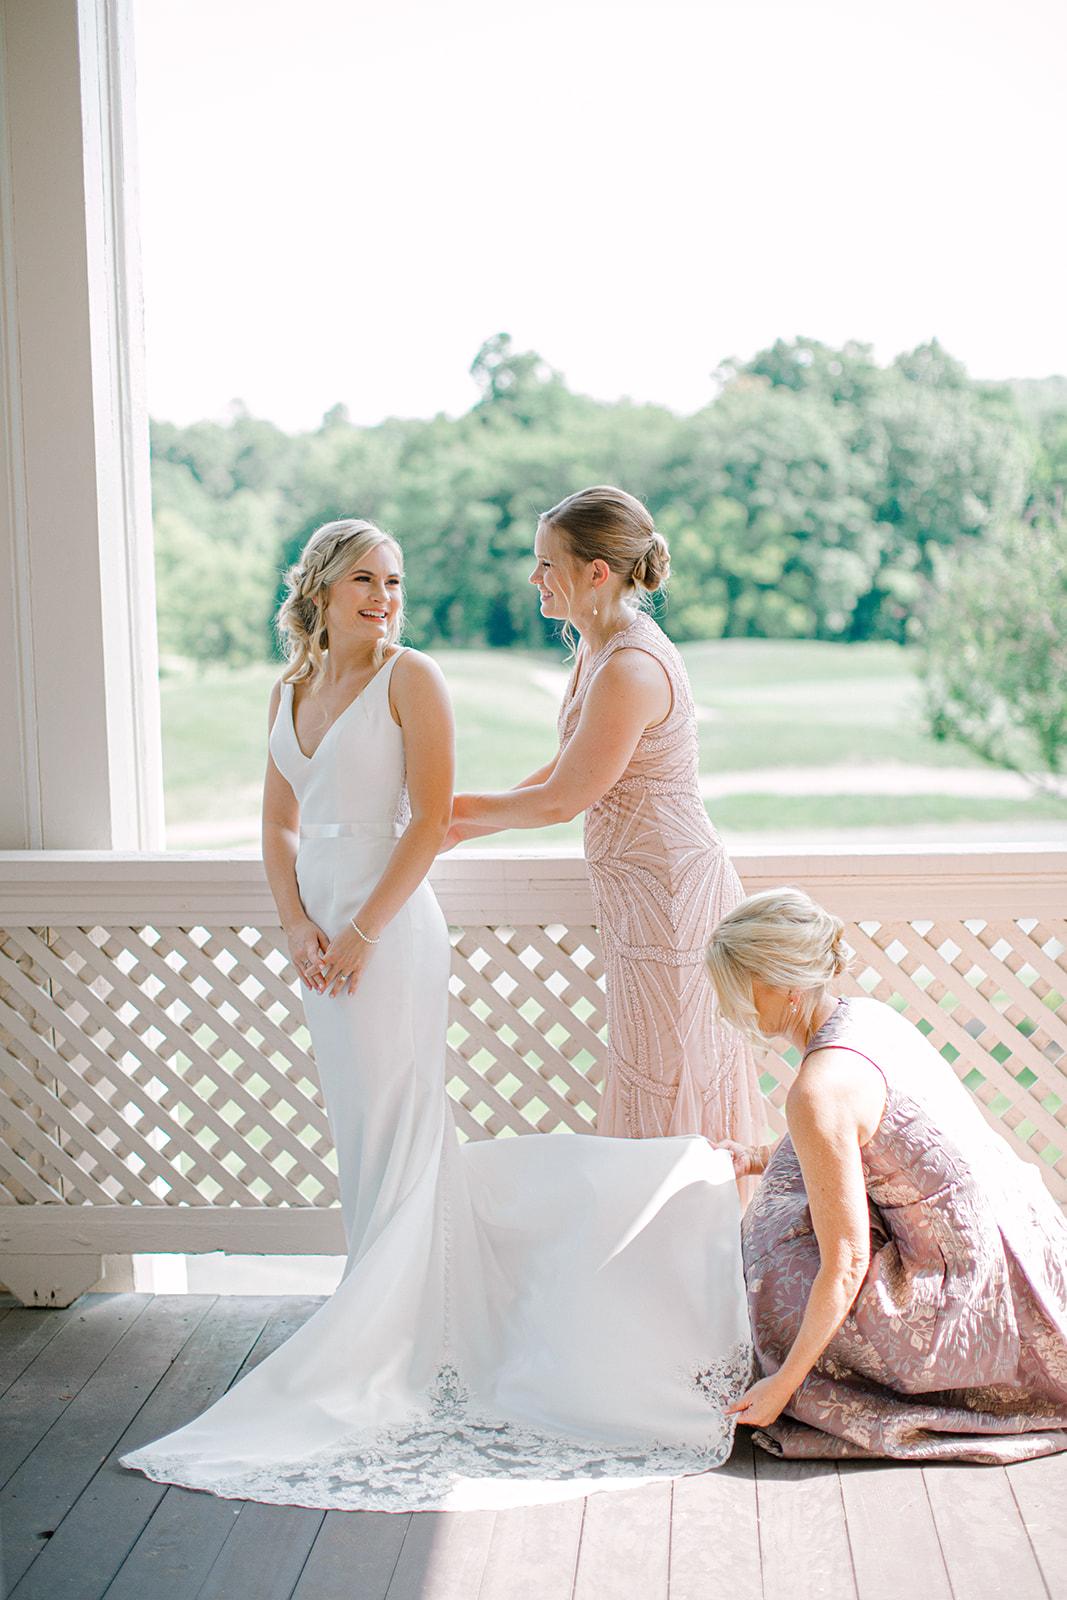 Tennessee Pleasant Hill Mansion Outdoor Wedding | Nashville Bride Guide